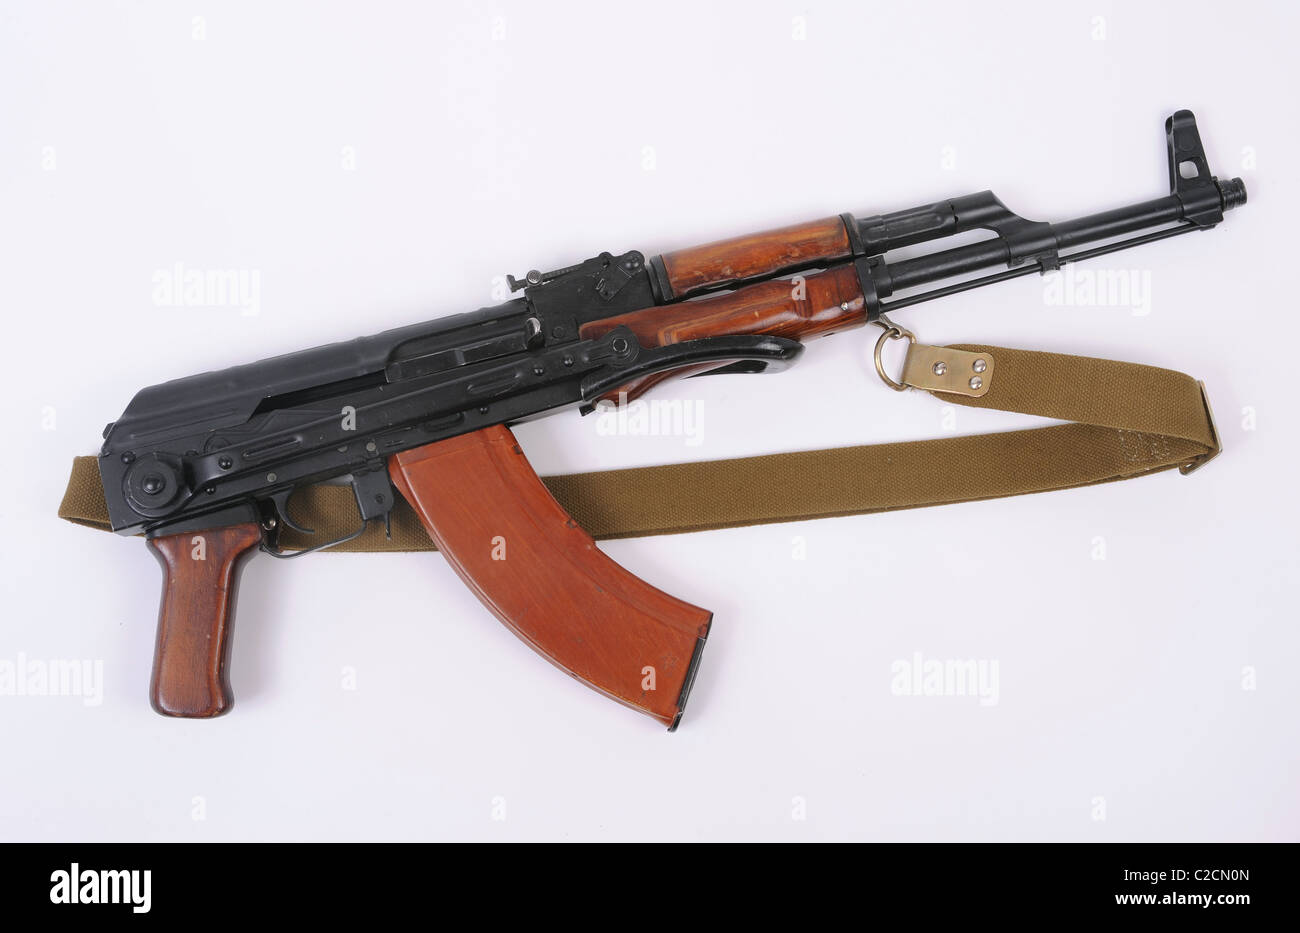 Russian AKMS rifle. Modernized folding stock version of the ubiquitous AK47  Kalashnikov assault rifle.